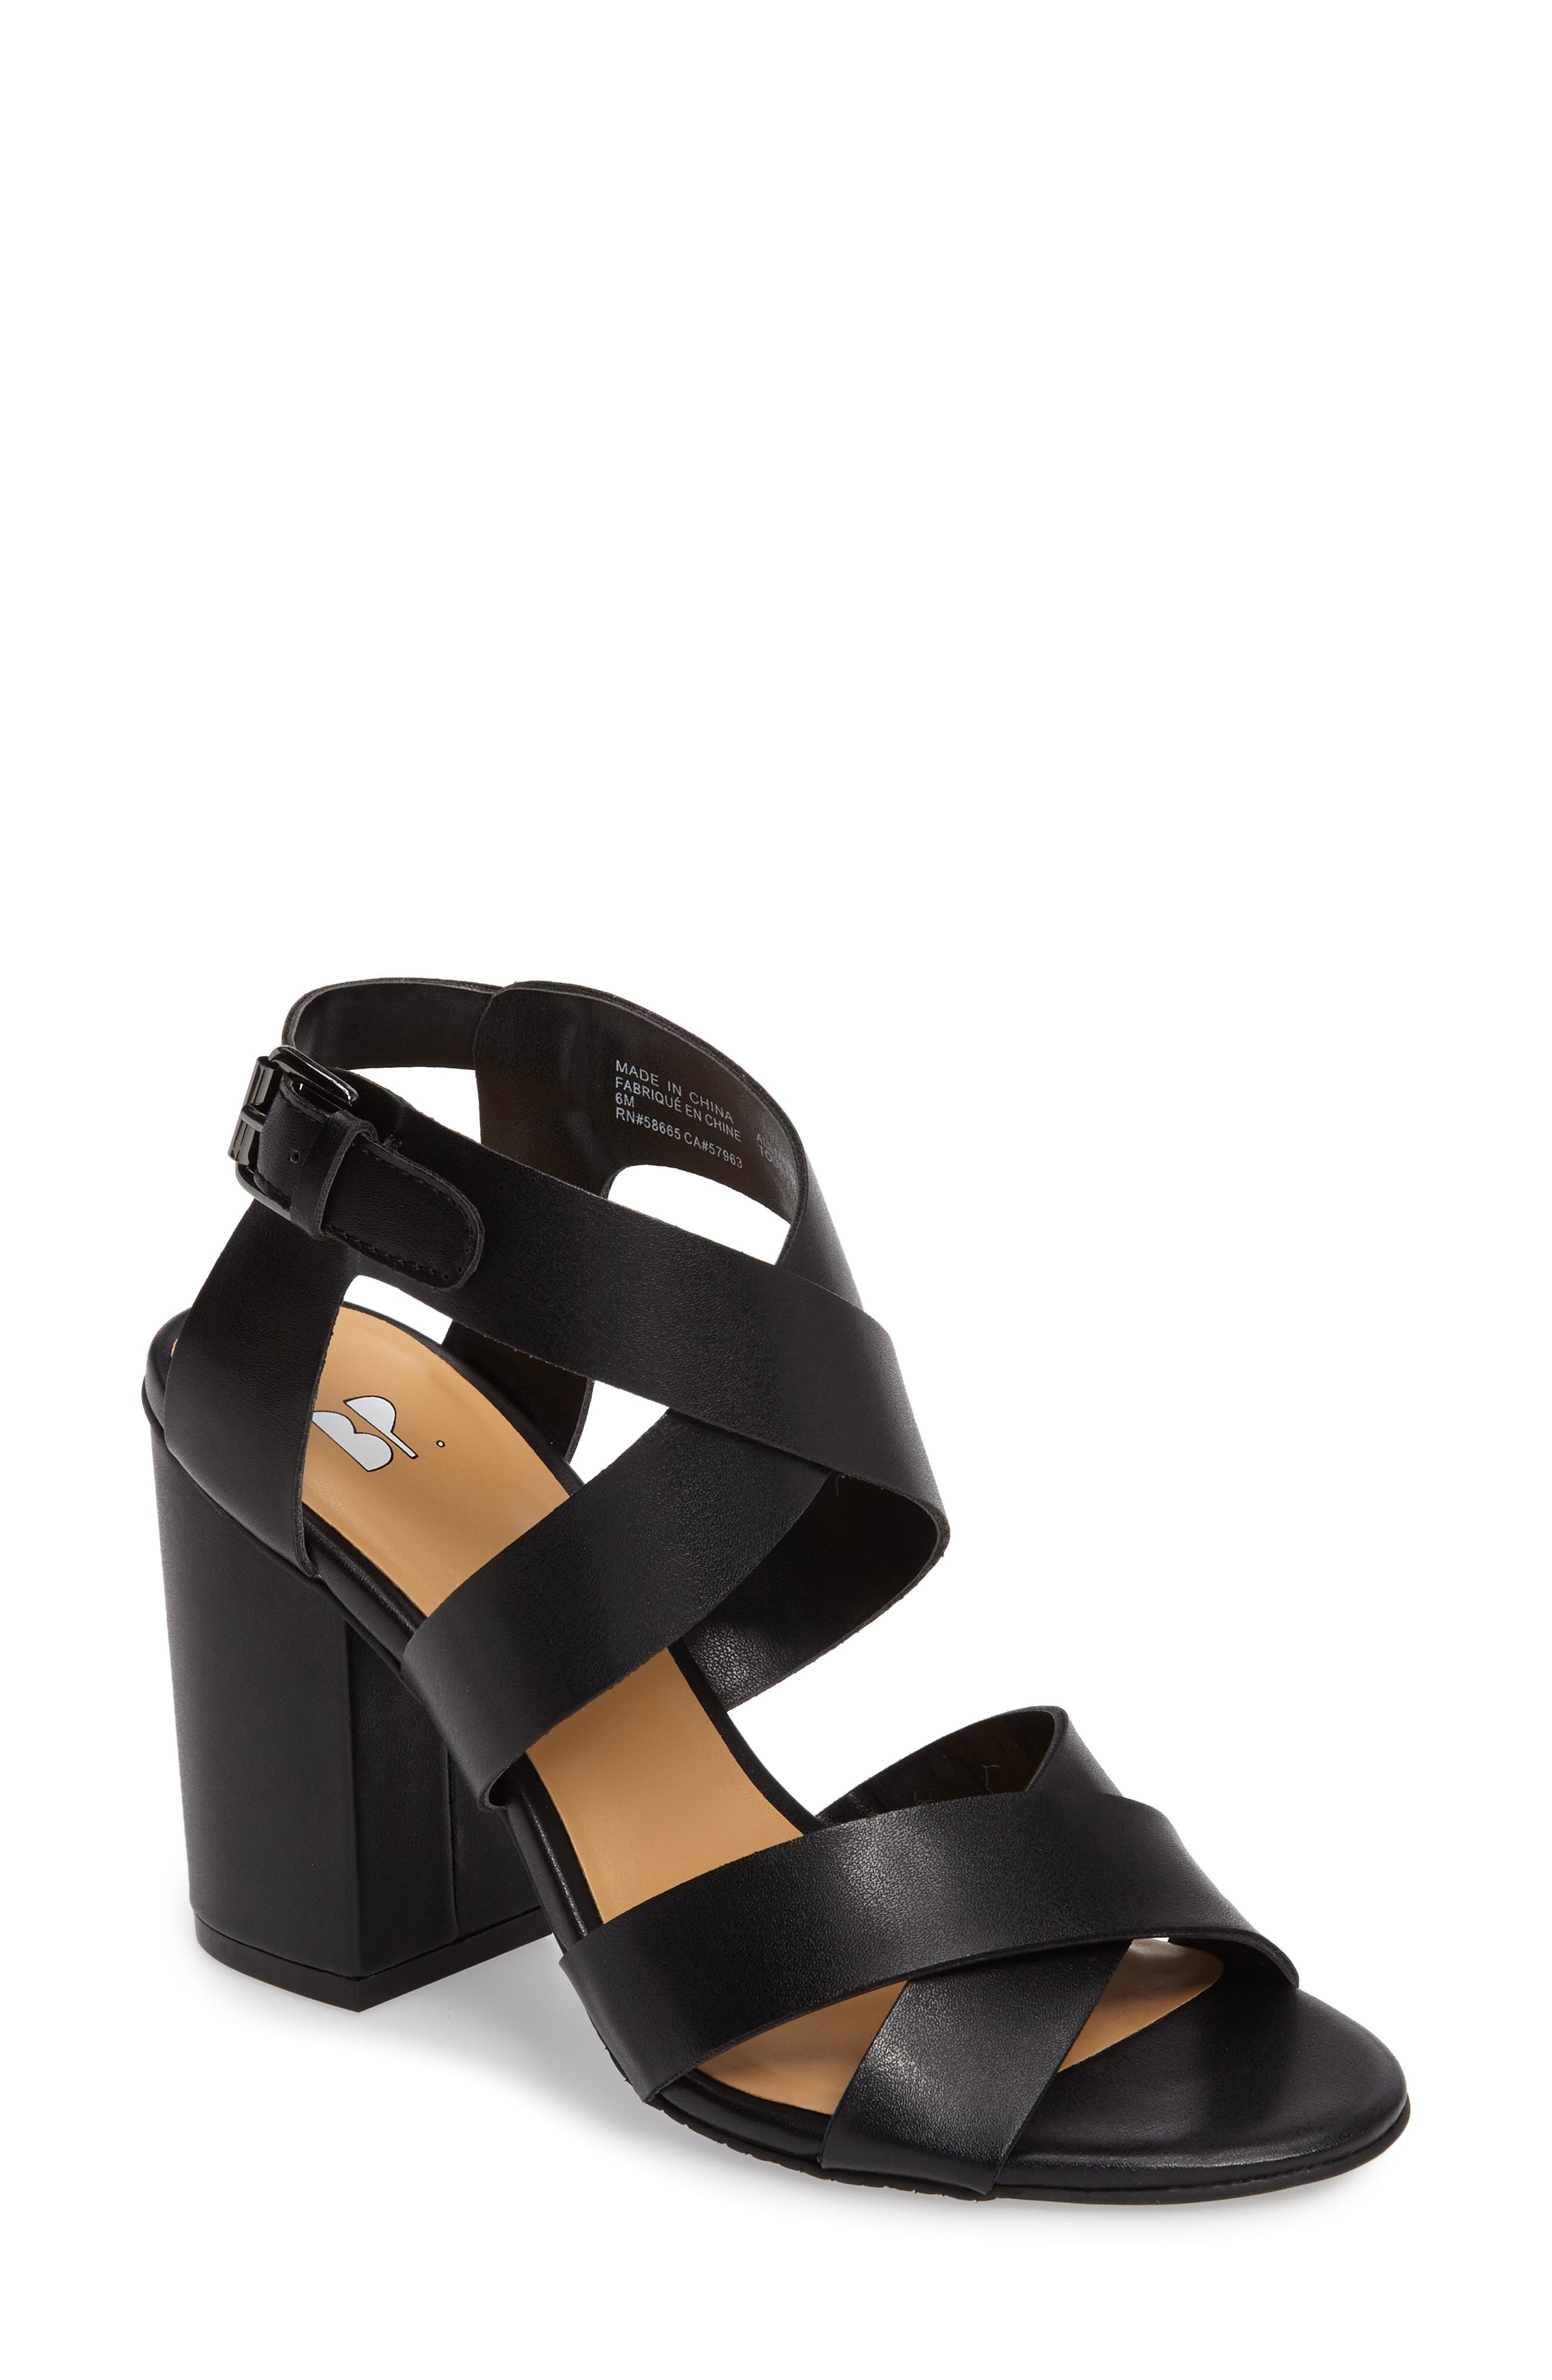 Terry Block Heel Sandal,                         Main,                         color, 001